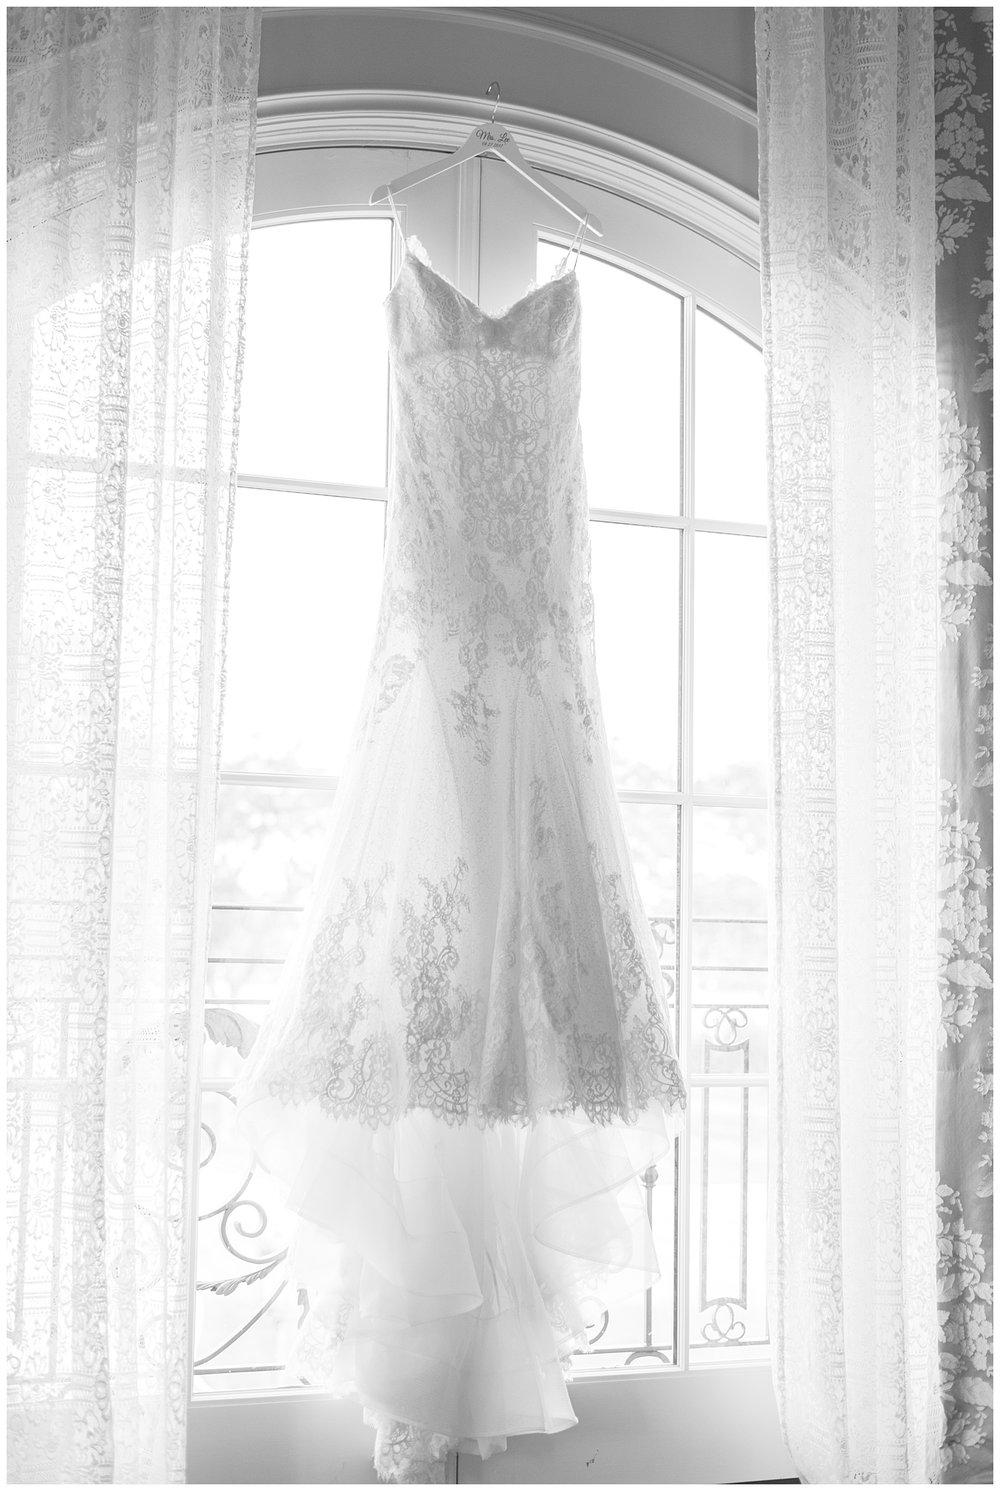 park-chateau-wedding-fabiana-skubic-photography (5).jpg